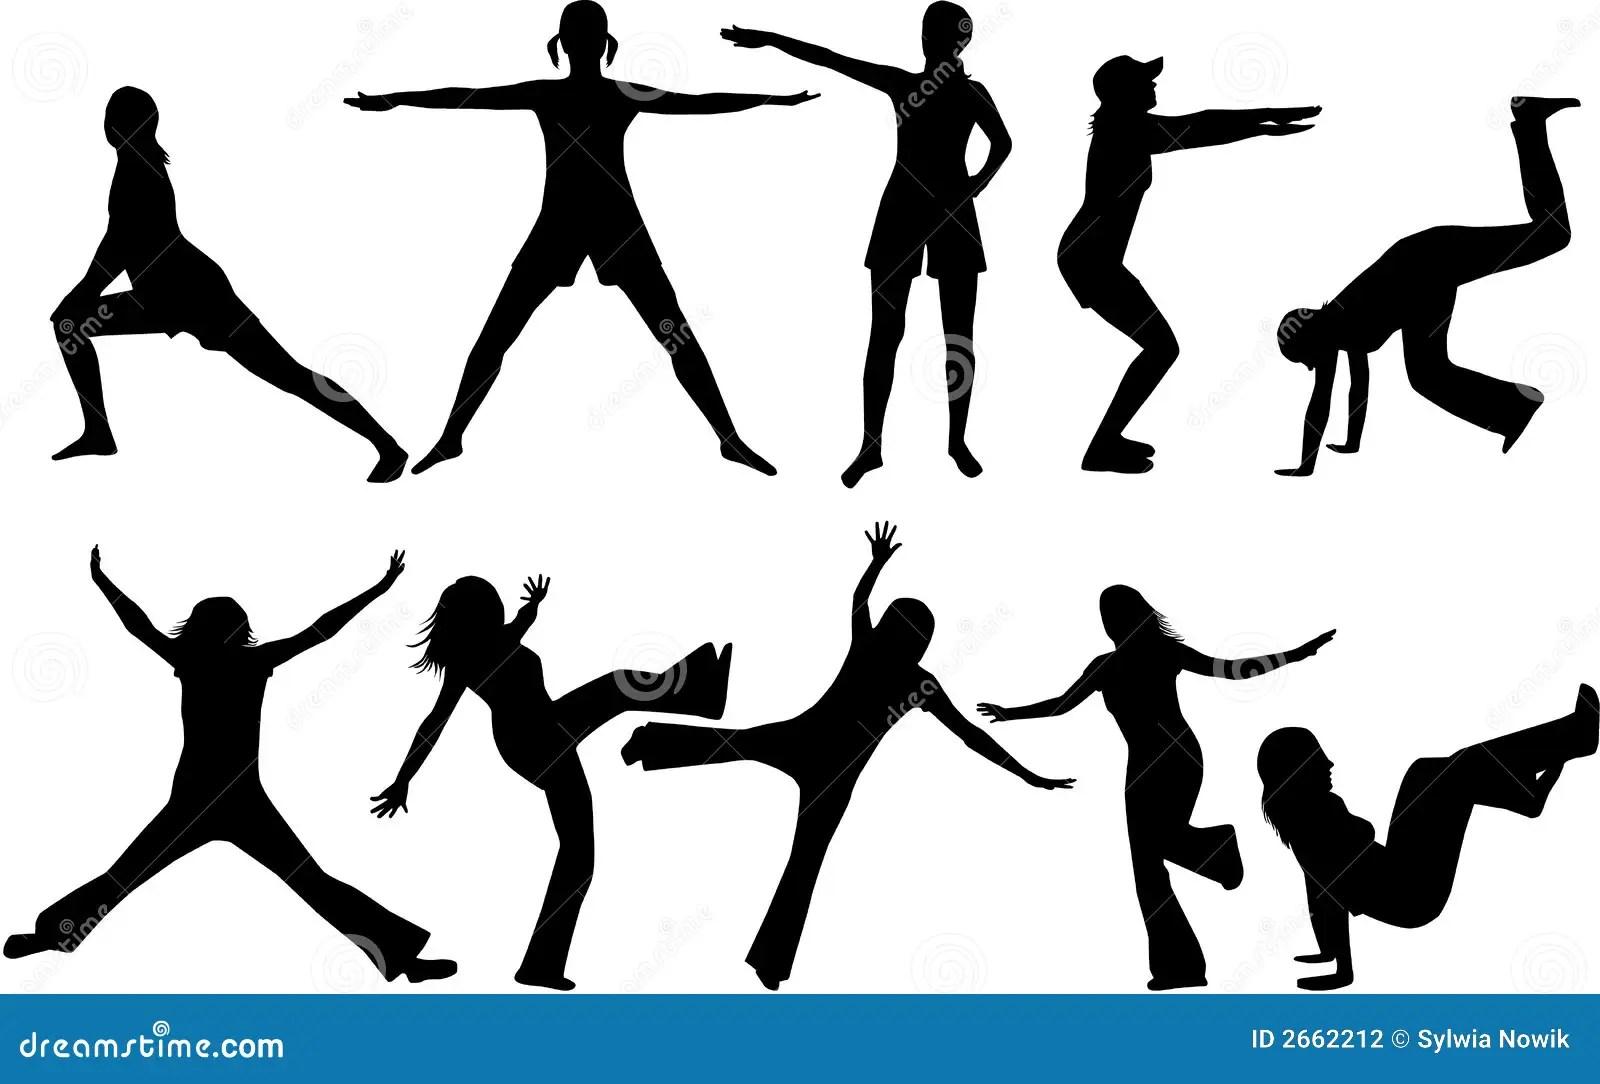 Gymnastics Silhouettes Stock Photography